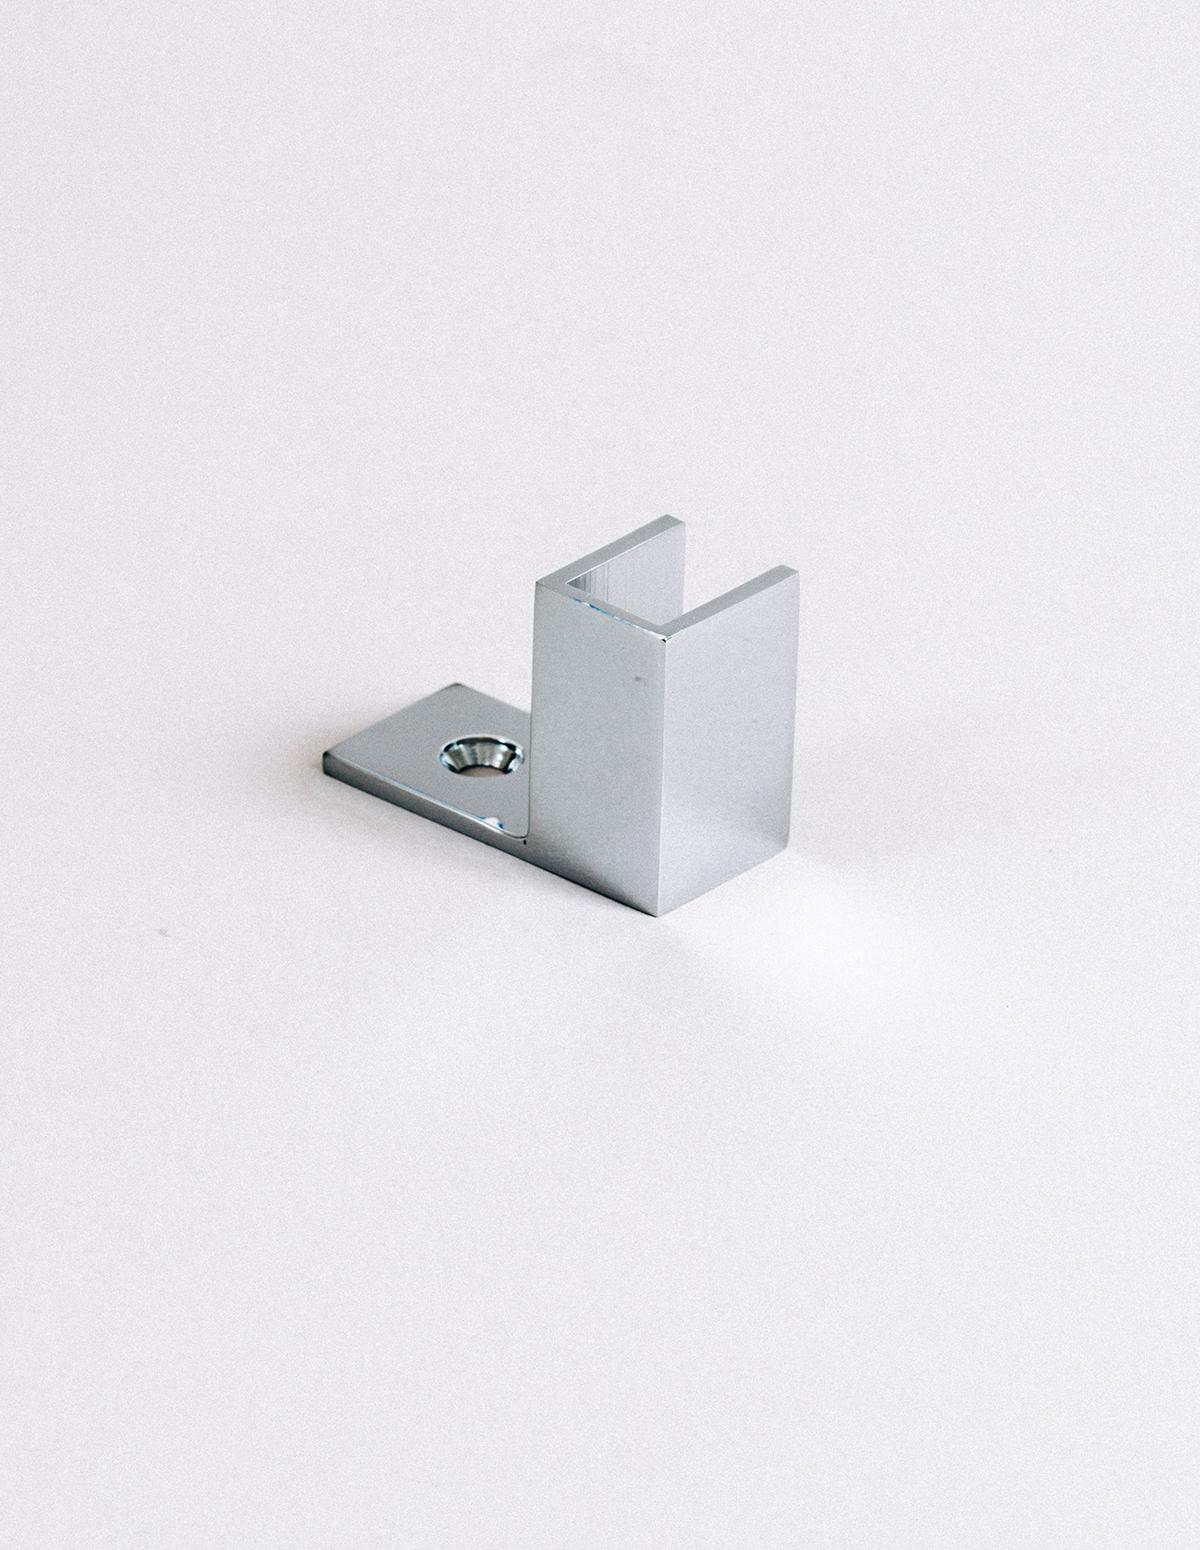 Optimum-Studios-Architectural-Glass-Metal-HardwarePage-GlassClip4-042216